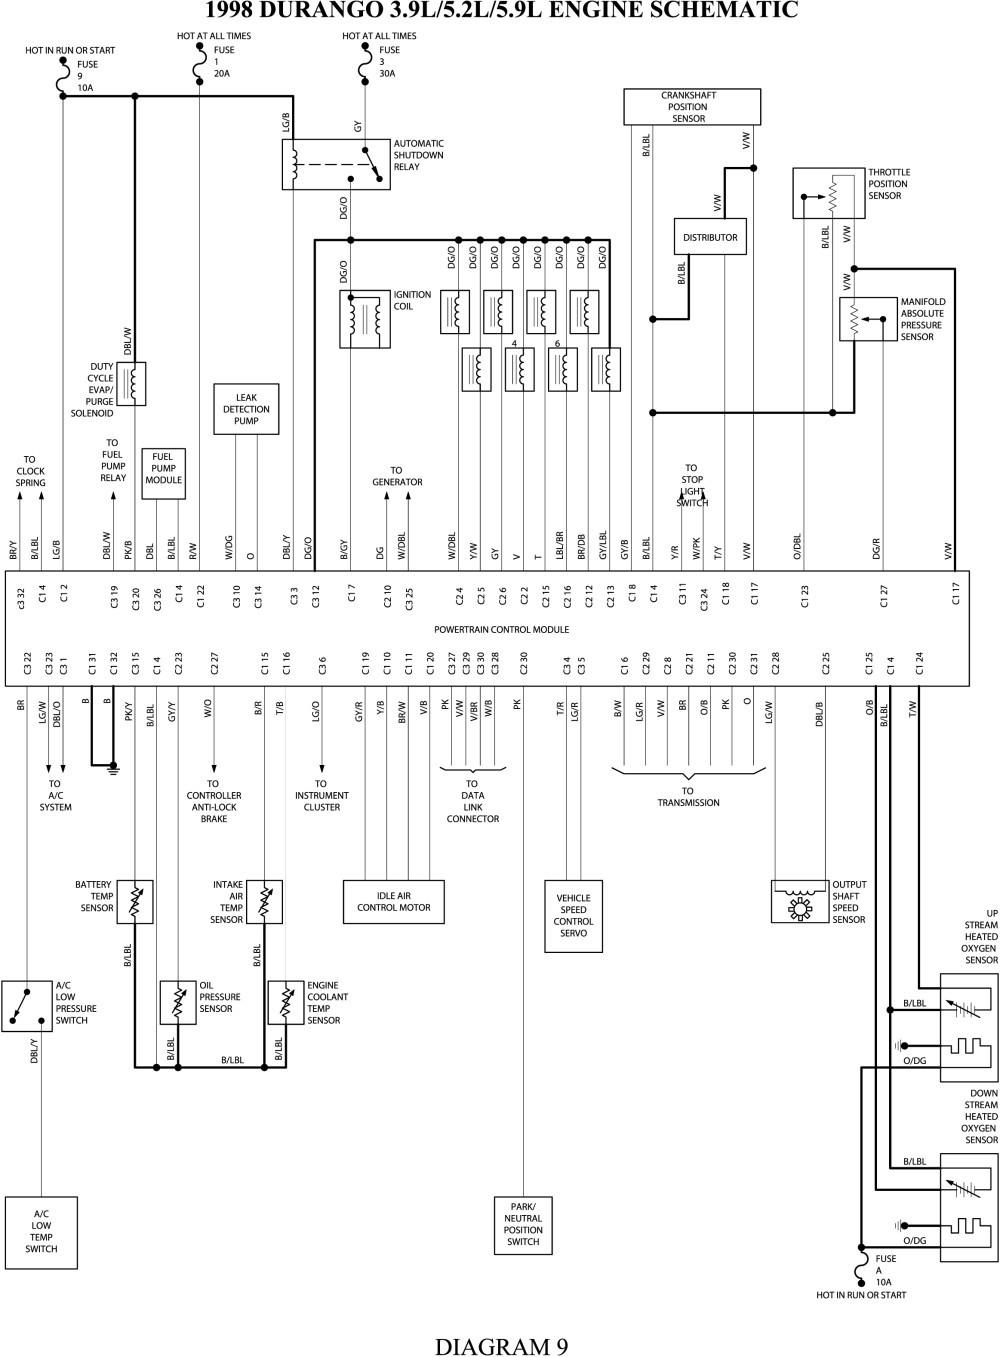 Wiring Harness For 1993 Dodge Dakota : Elegant dodge dakota wiring diagram